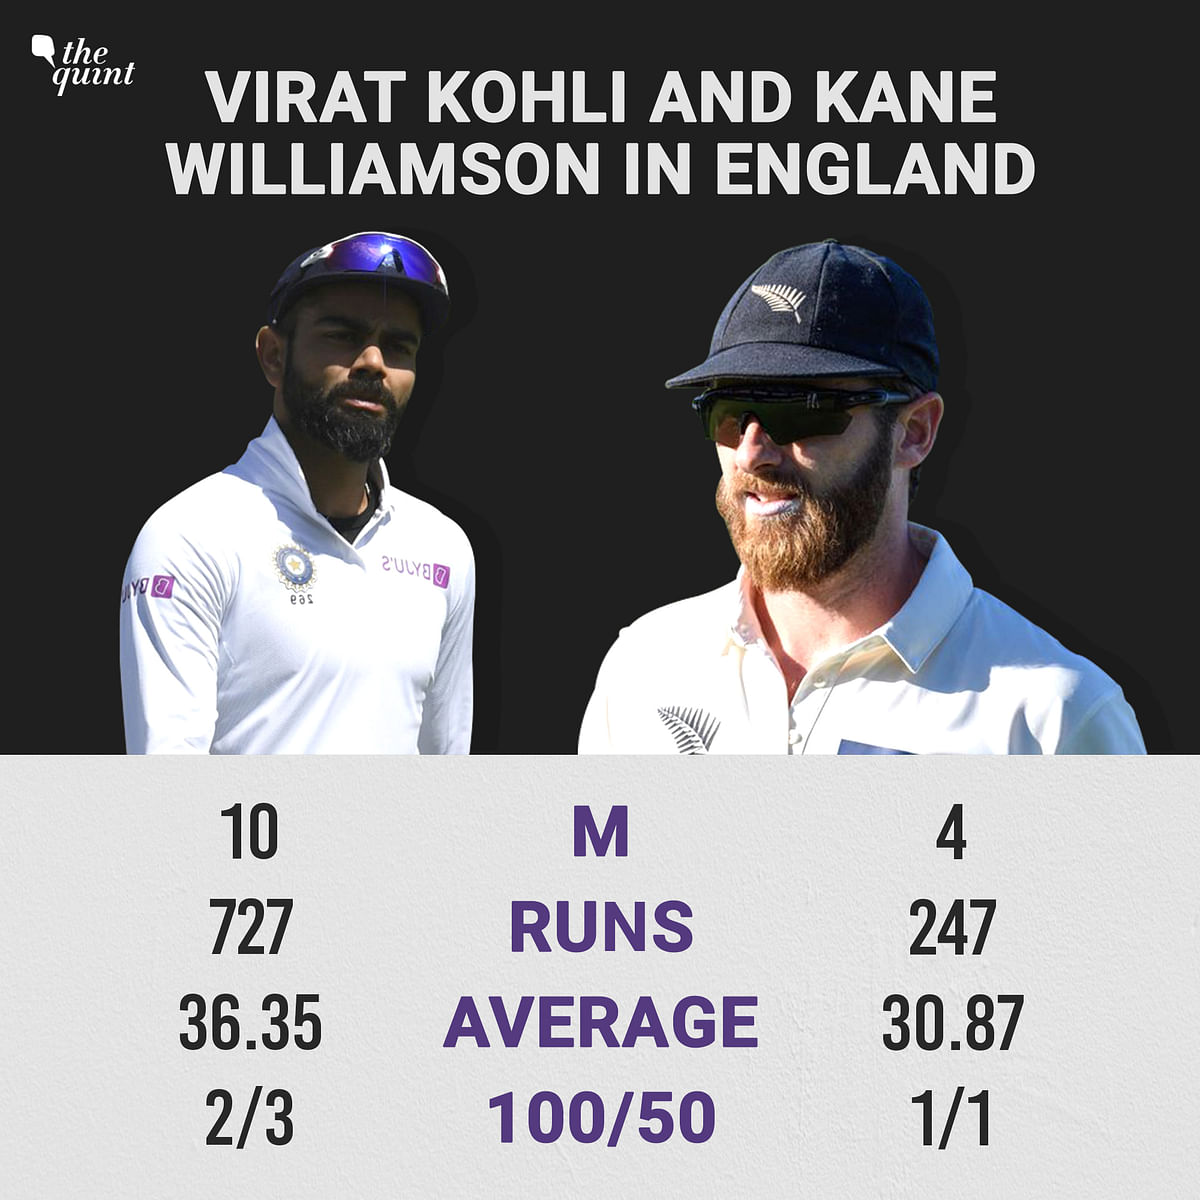 Comparing Virat Kohli and Kane Williamson's WTC Campaigns